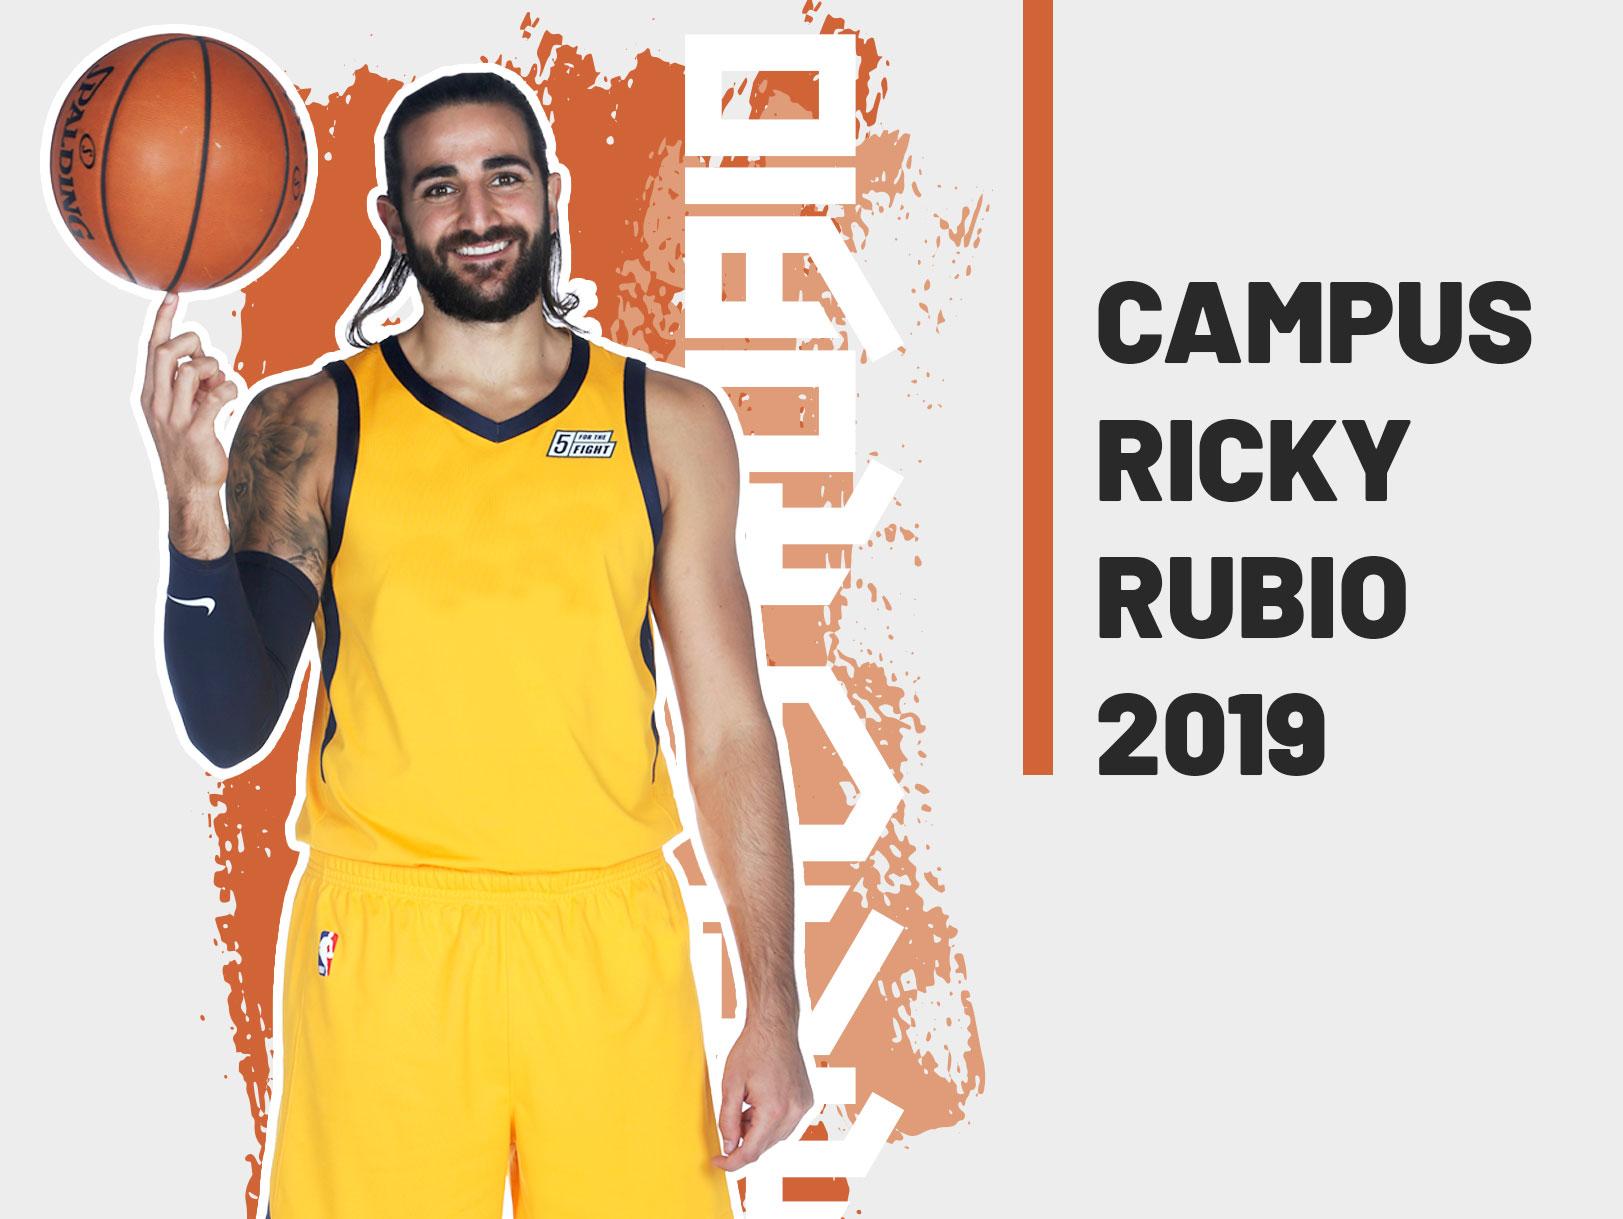 Campamento de Verano Ricky Rubio